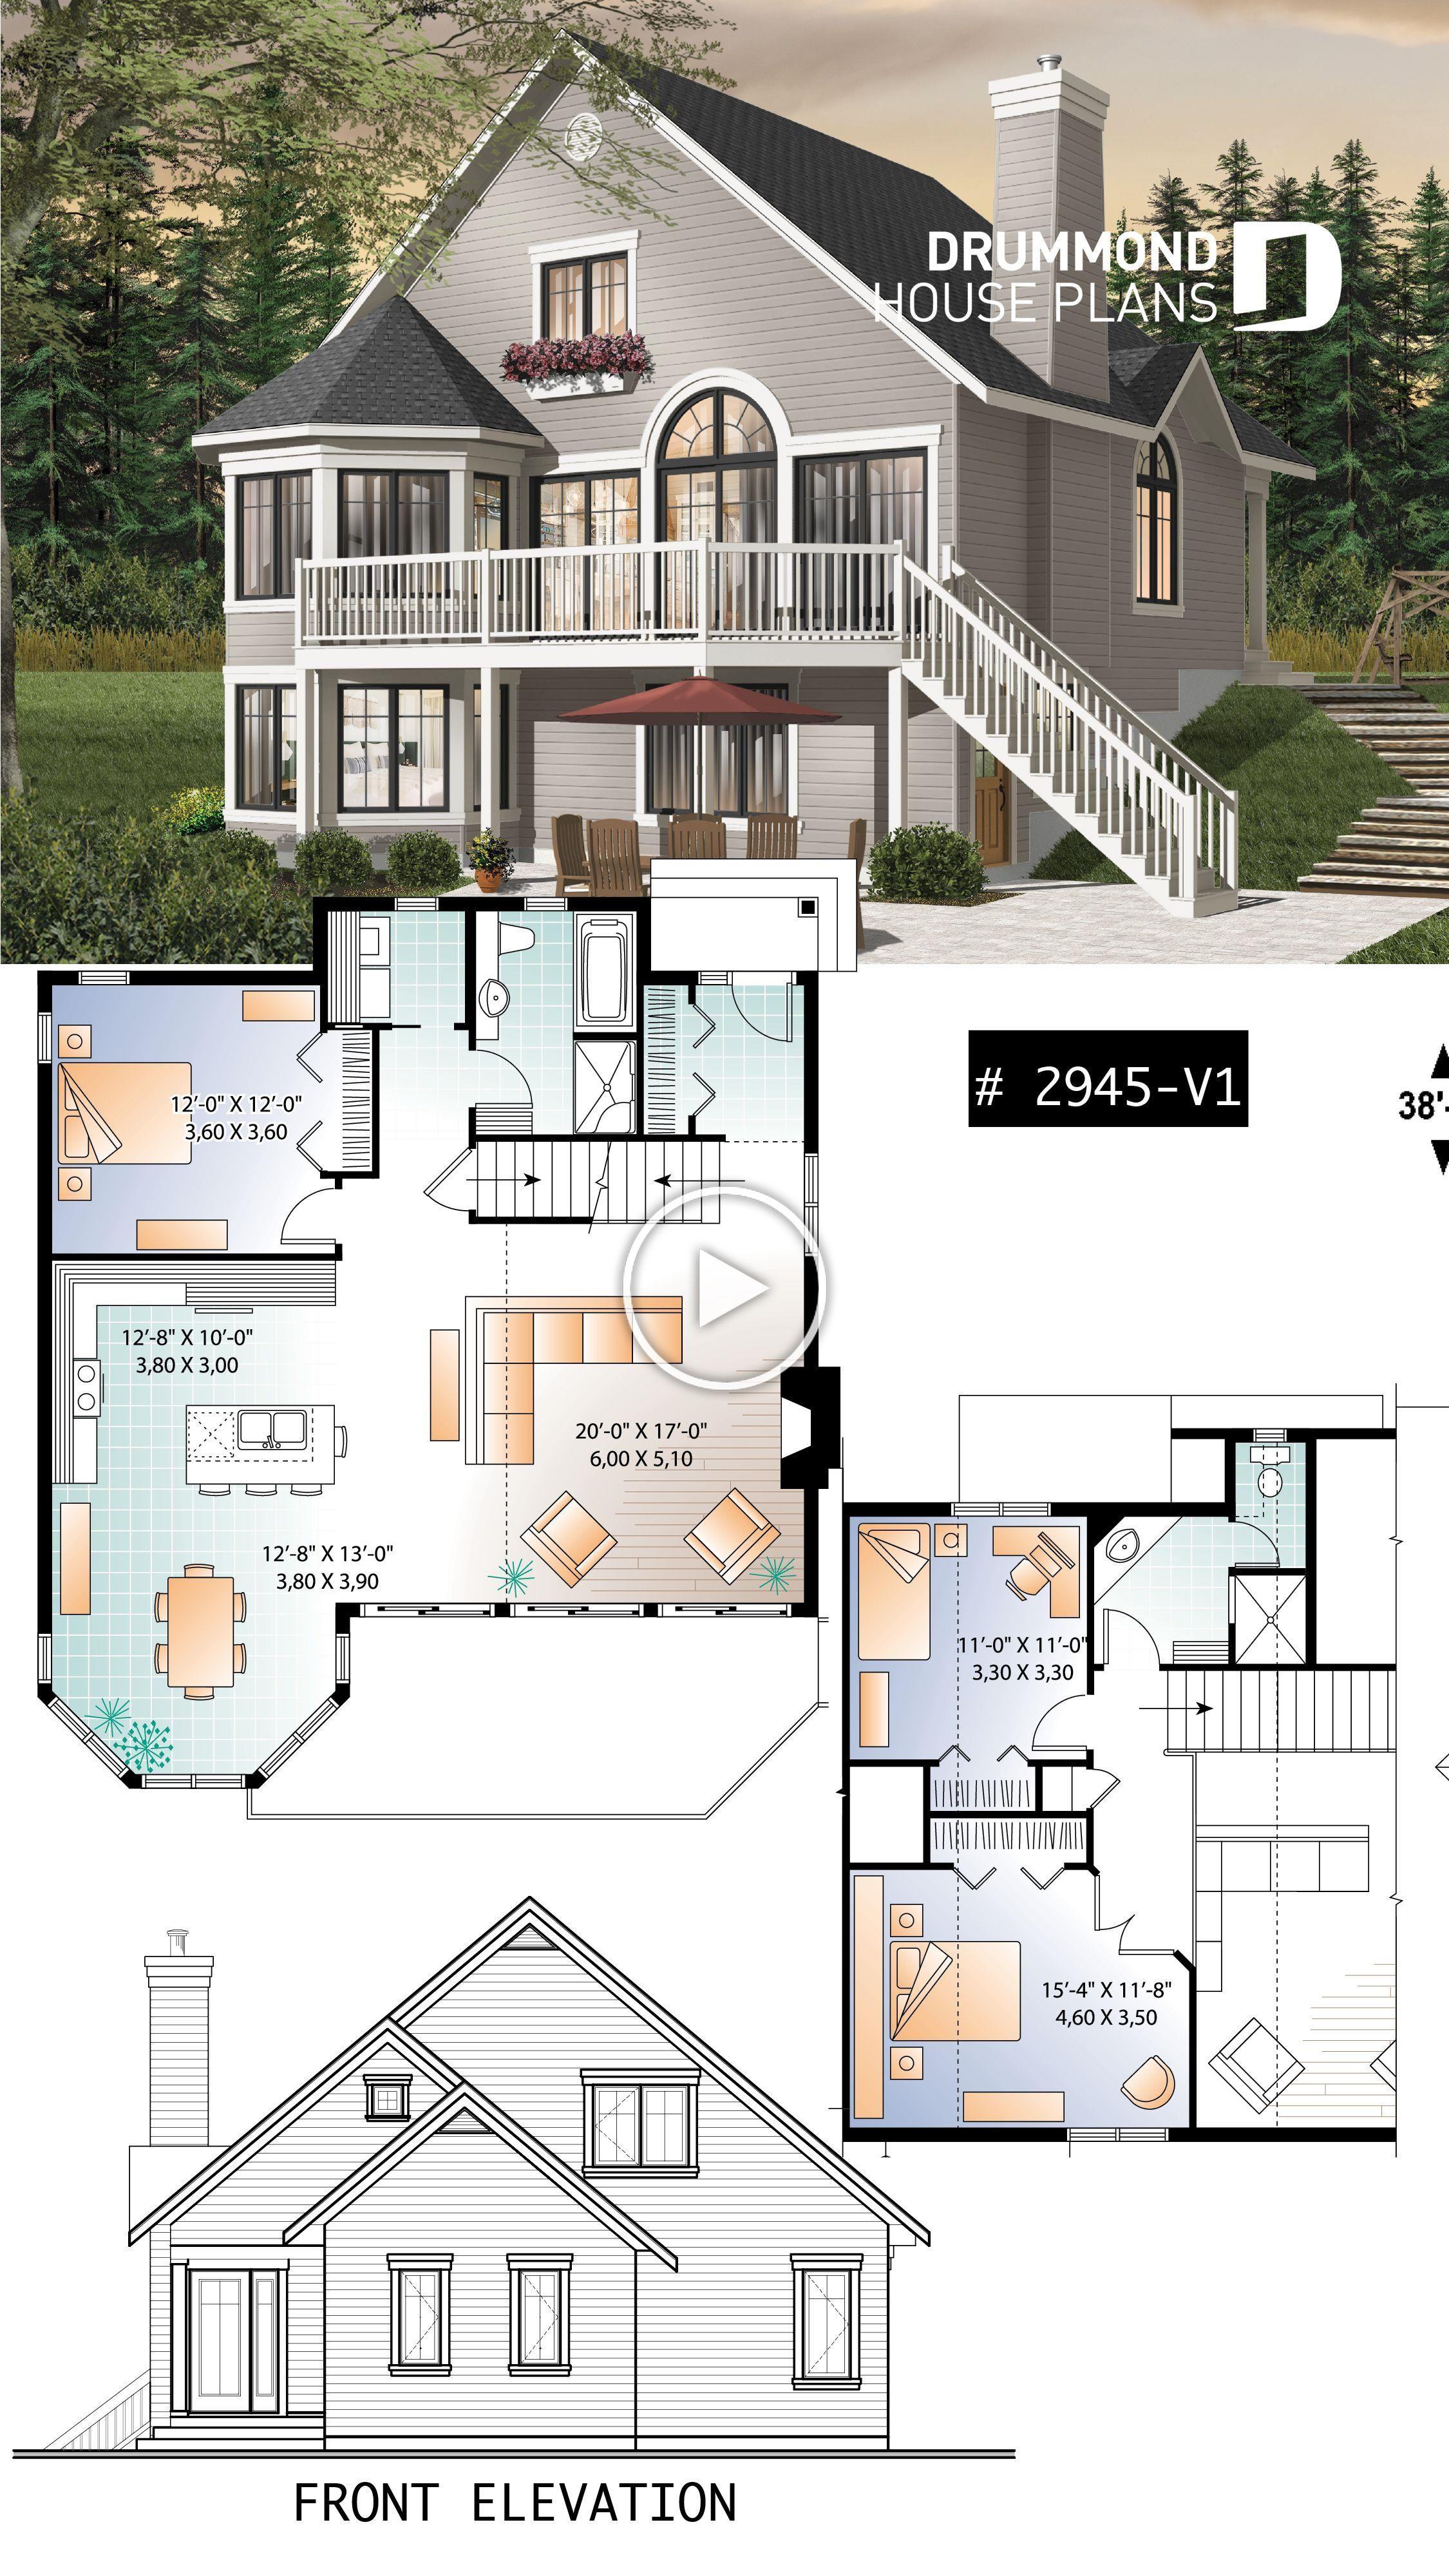 Popular 3 Bedroom Chalet With Mezzanine And Convivial Floor Plan Chalet Cottage Plan Houseplan H Sims House Plans Sims 4 House Building Sims 4 House Plans